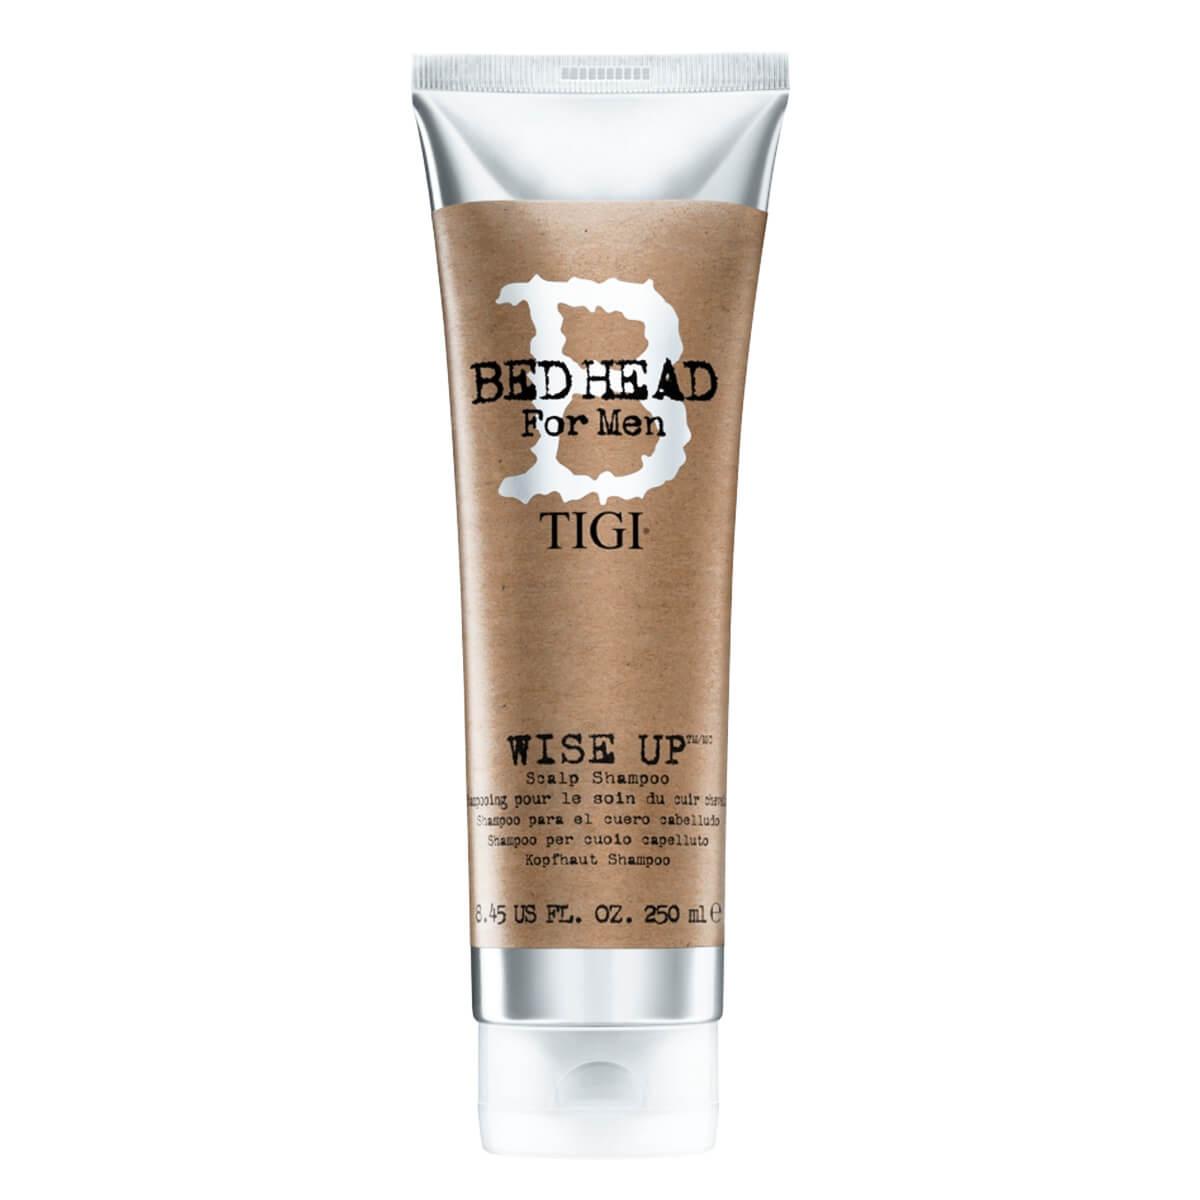 Shampoo Bed Head Men Wise Up 250ml 250ml